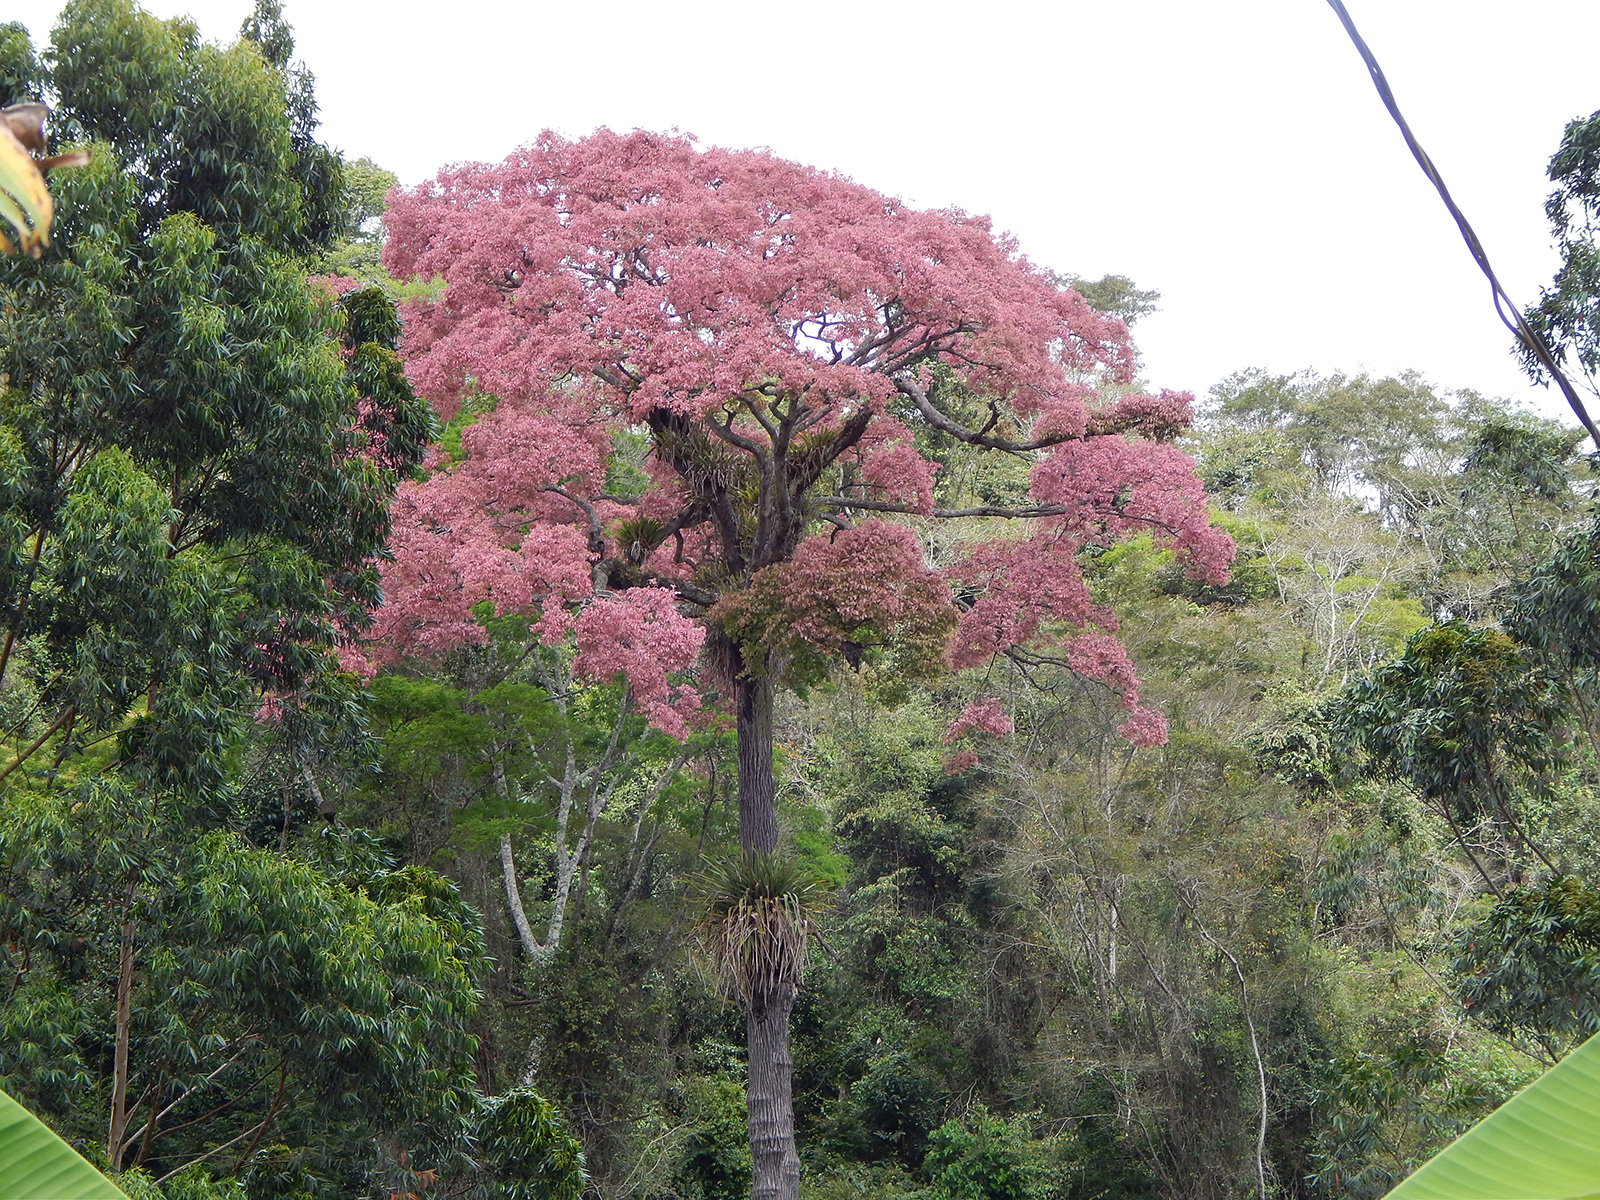 sapucaia (Lecythis pisonis) Brazil